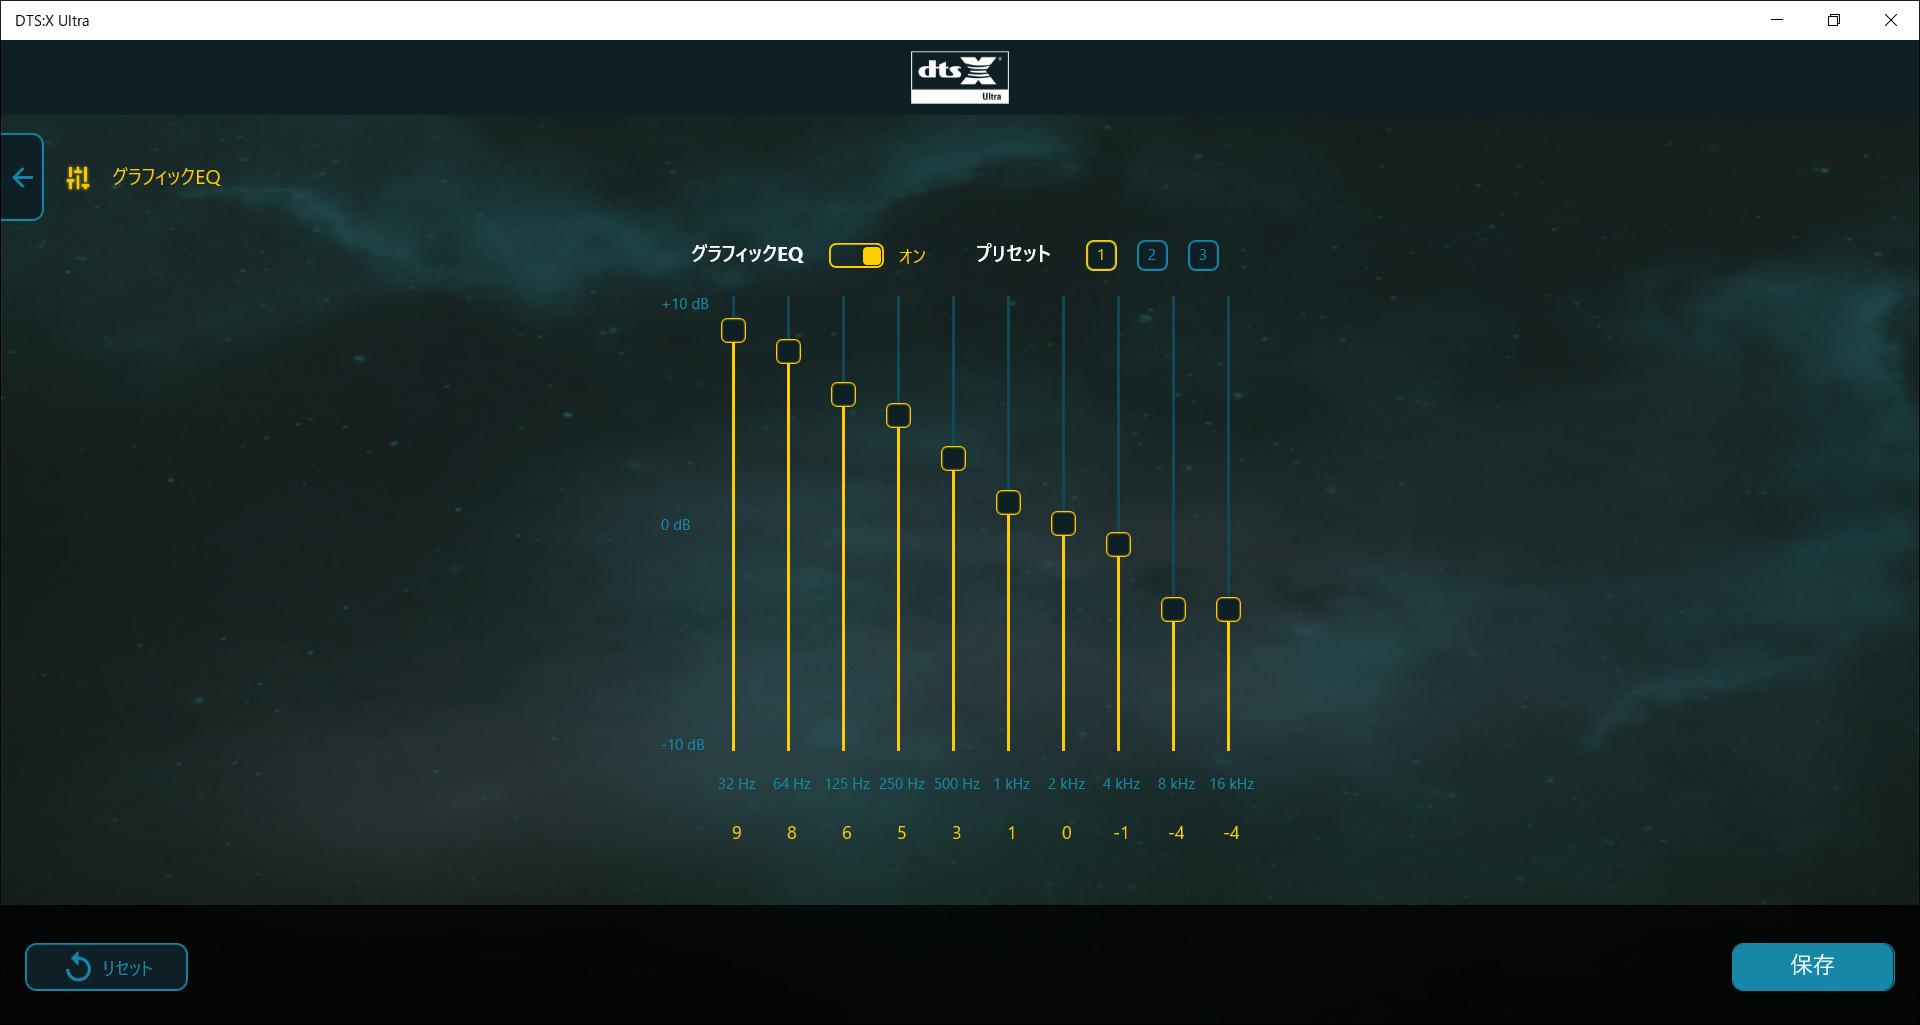 ASUS TUF Gaming A15 DTS:X